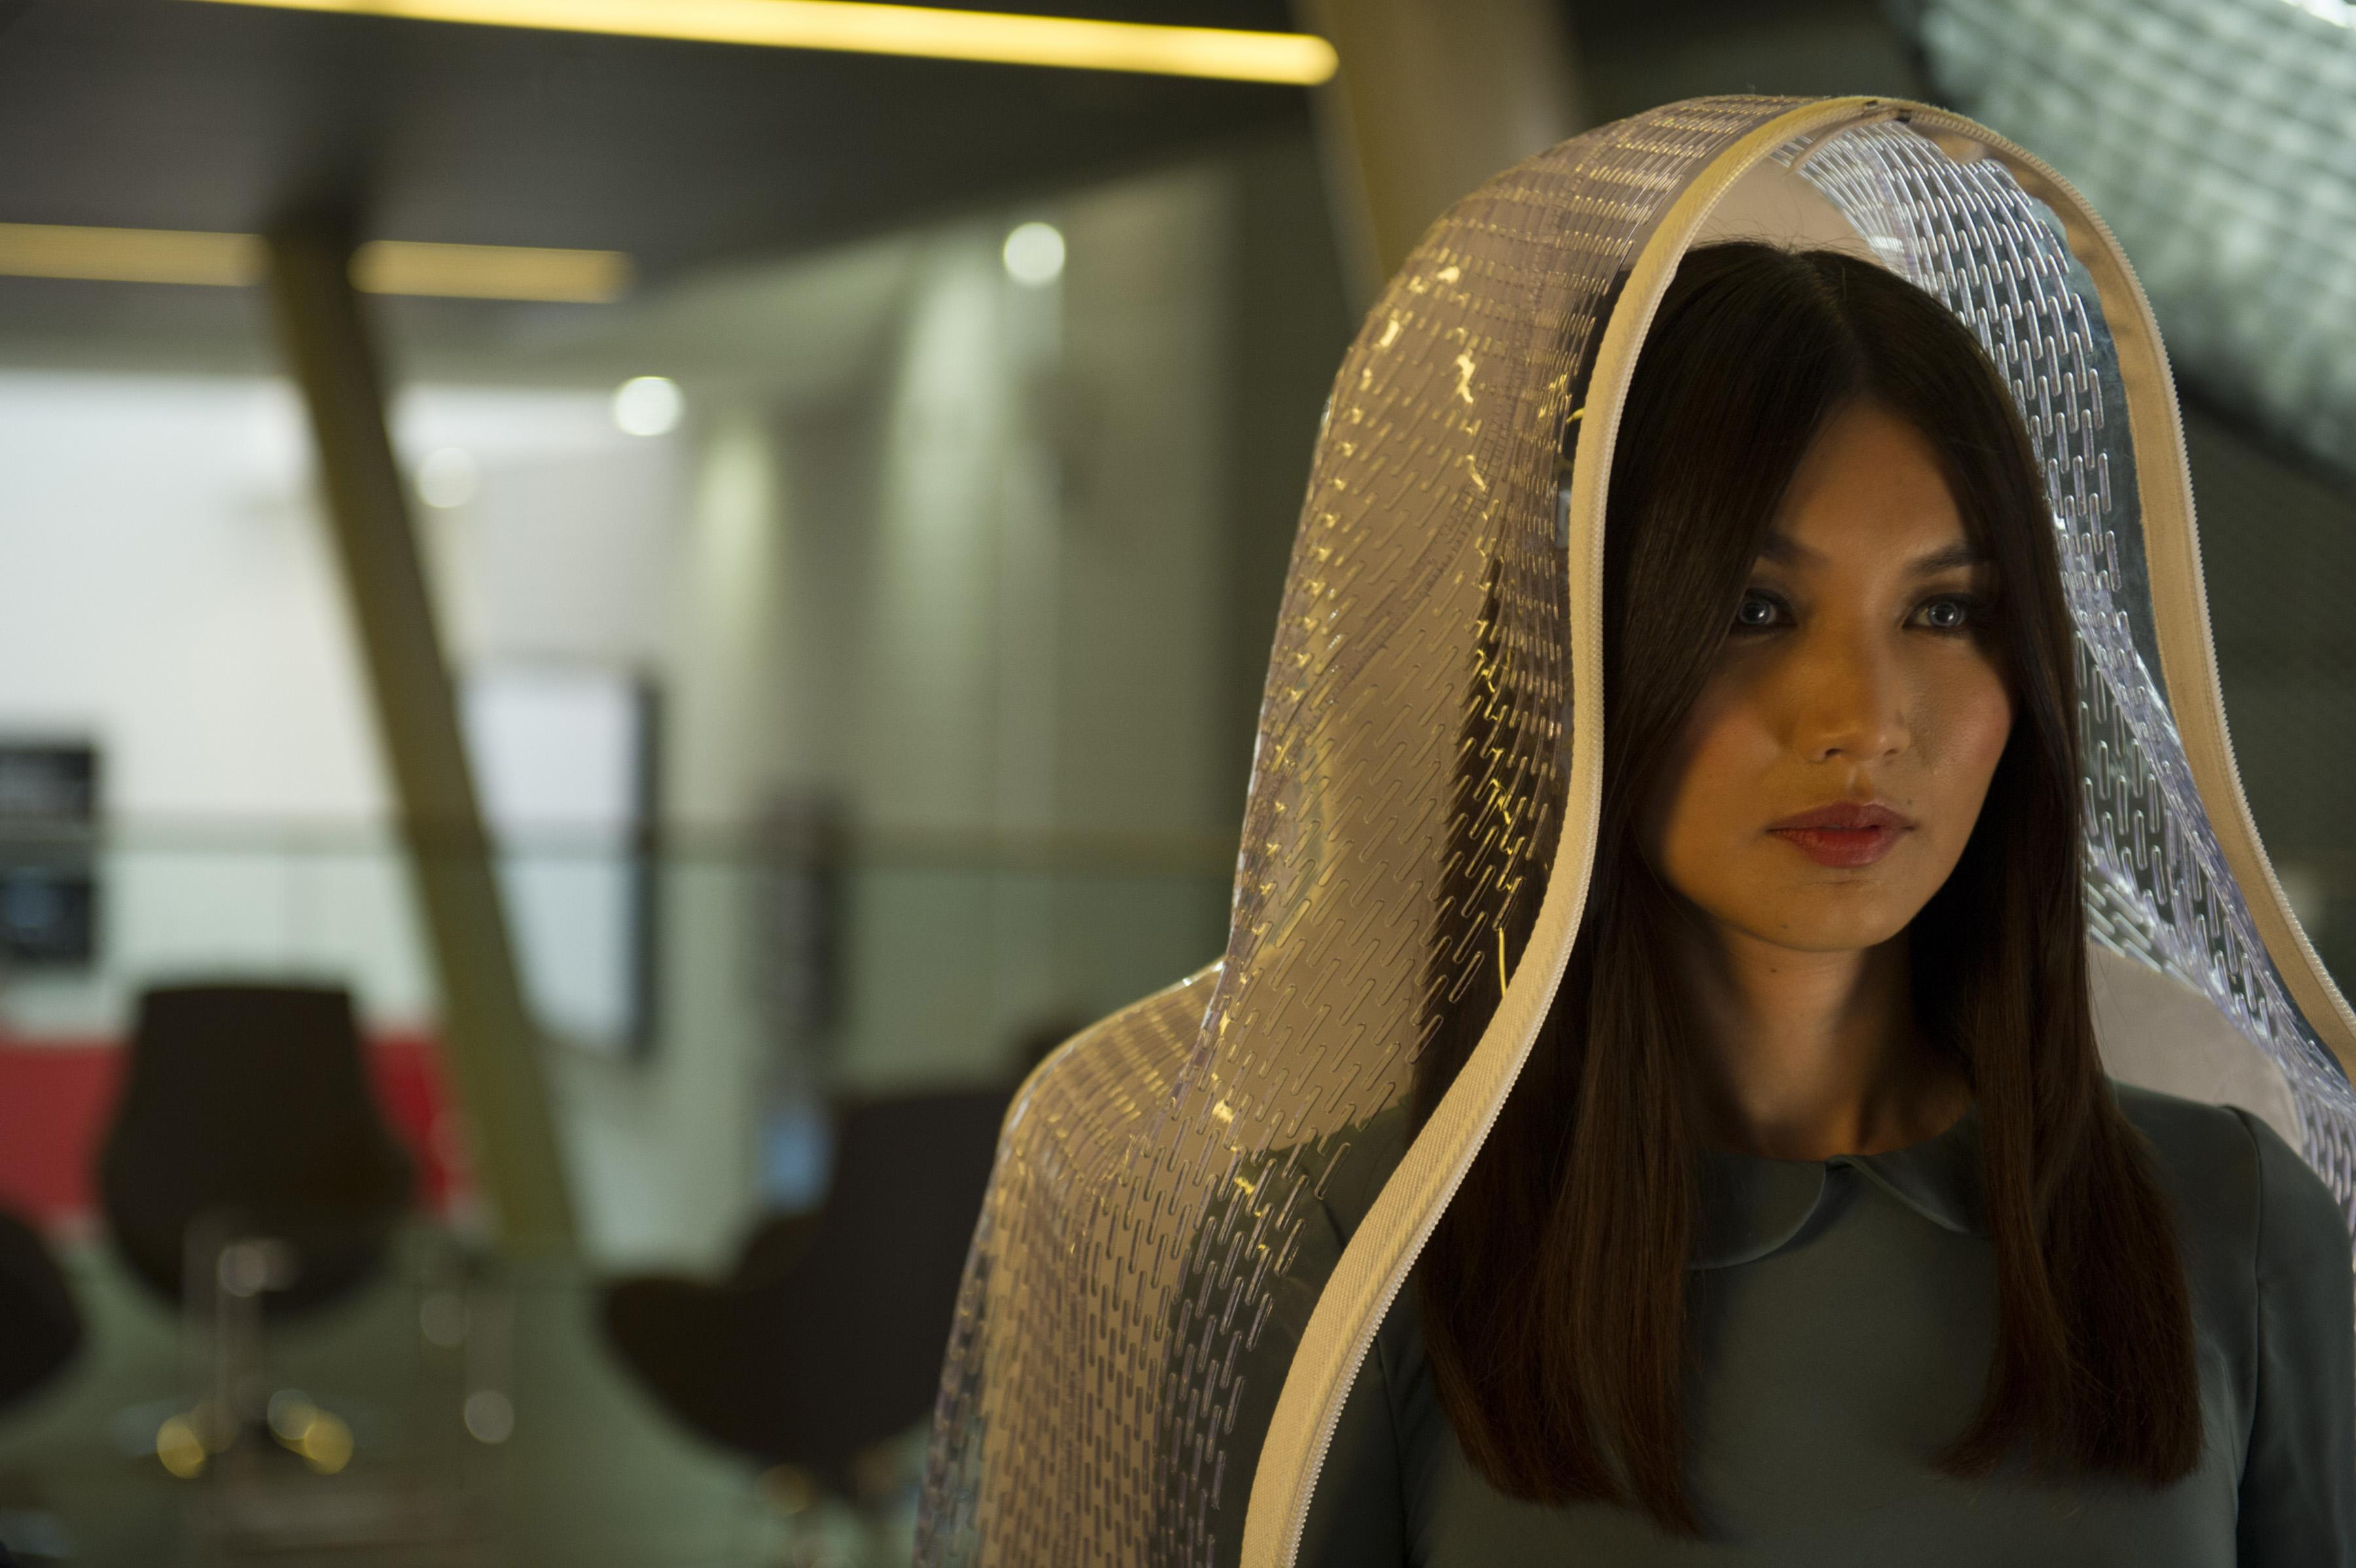 Фото:AMC Studios, Channel 4 Television Corporation, Endemol Shine Group, Kudos Film and Television, Matador Film